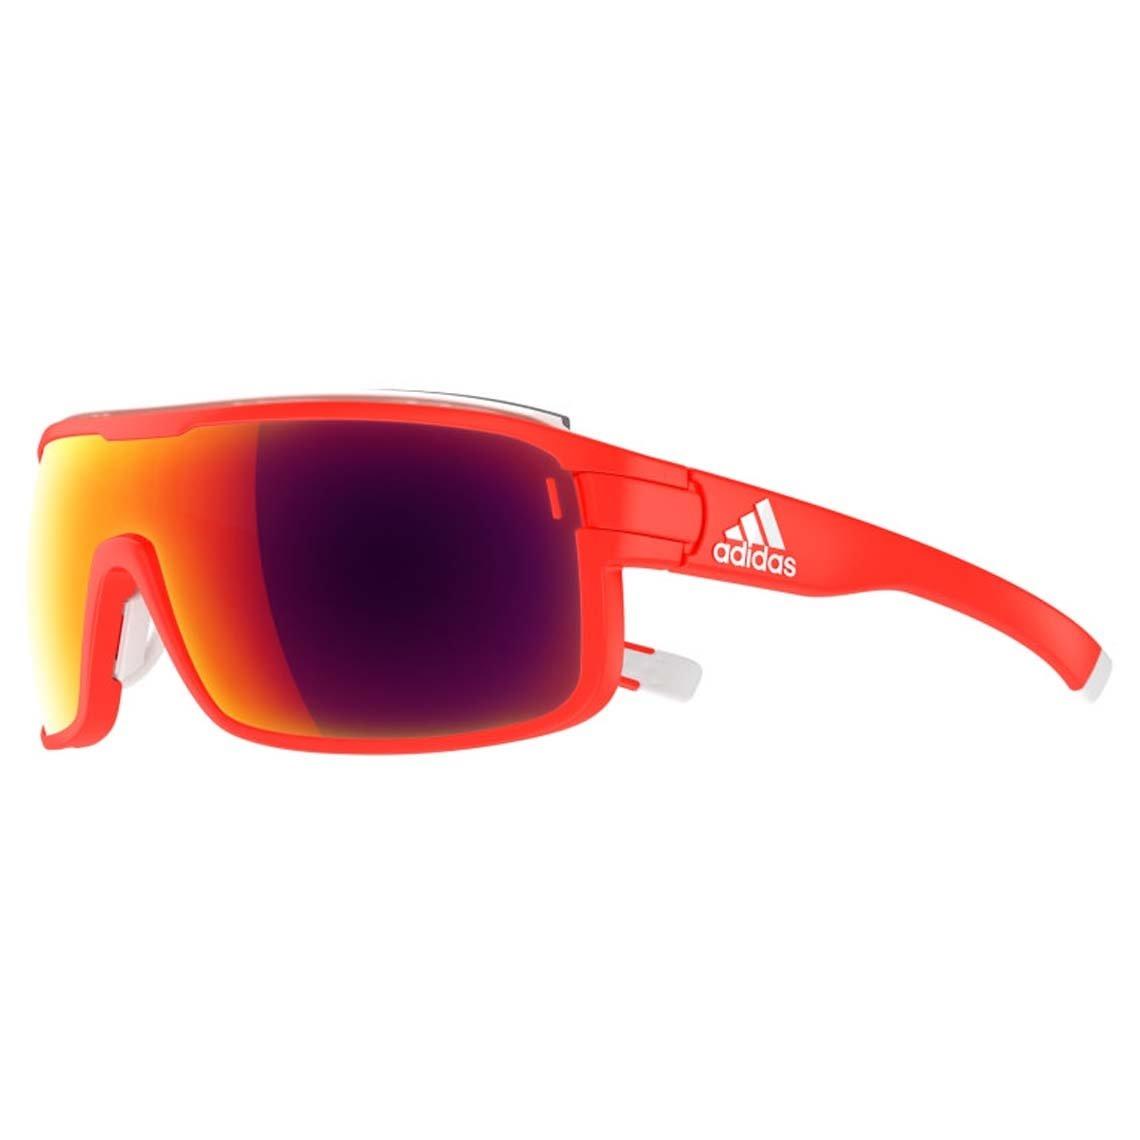 Adidas Zonyk AD02/00 6050 00/00